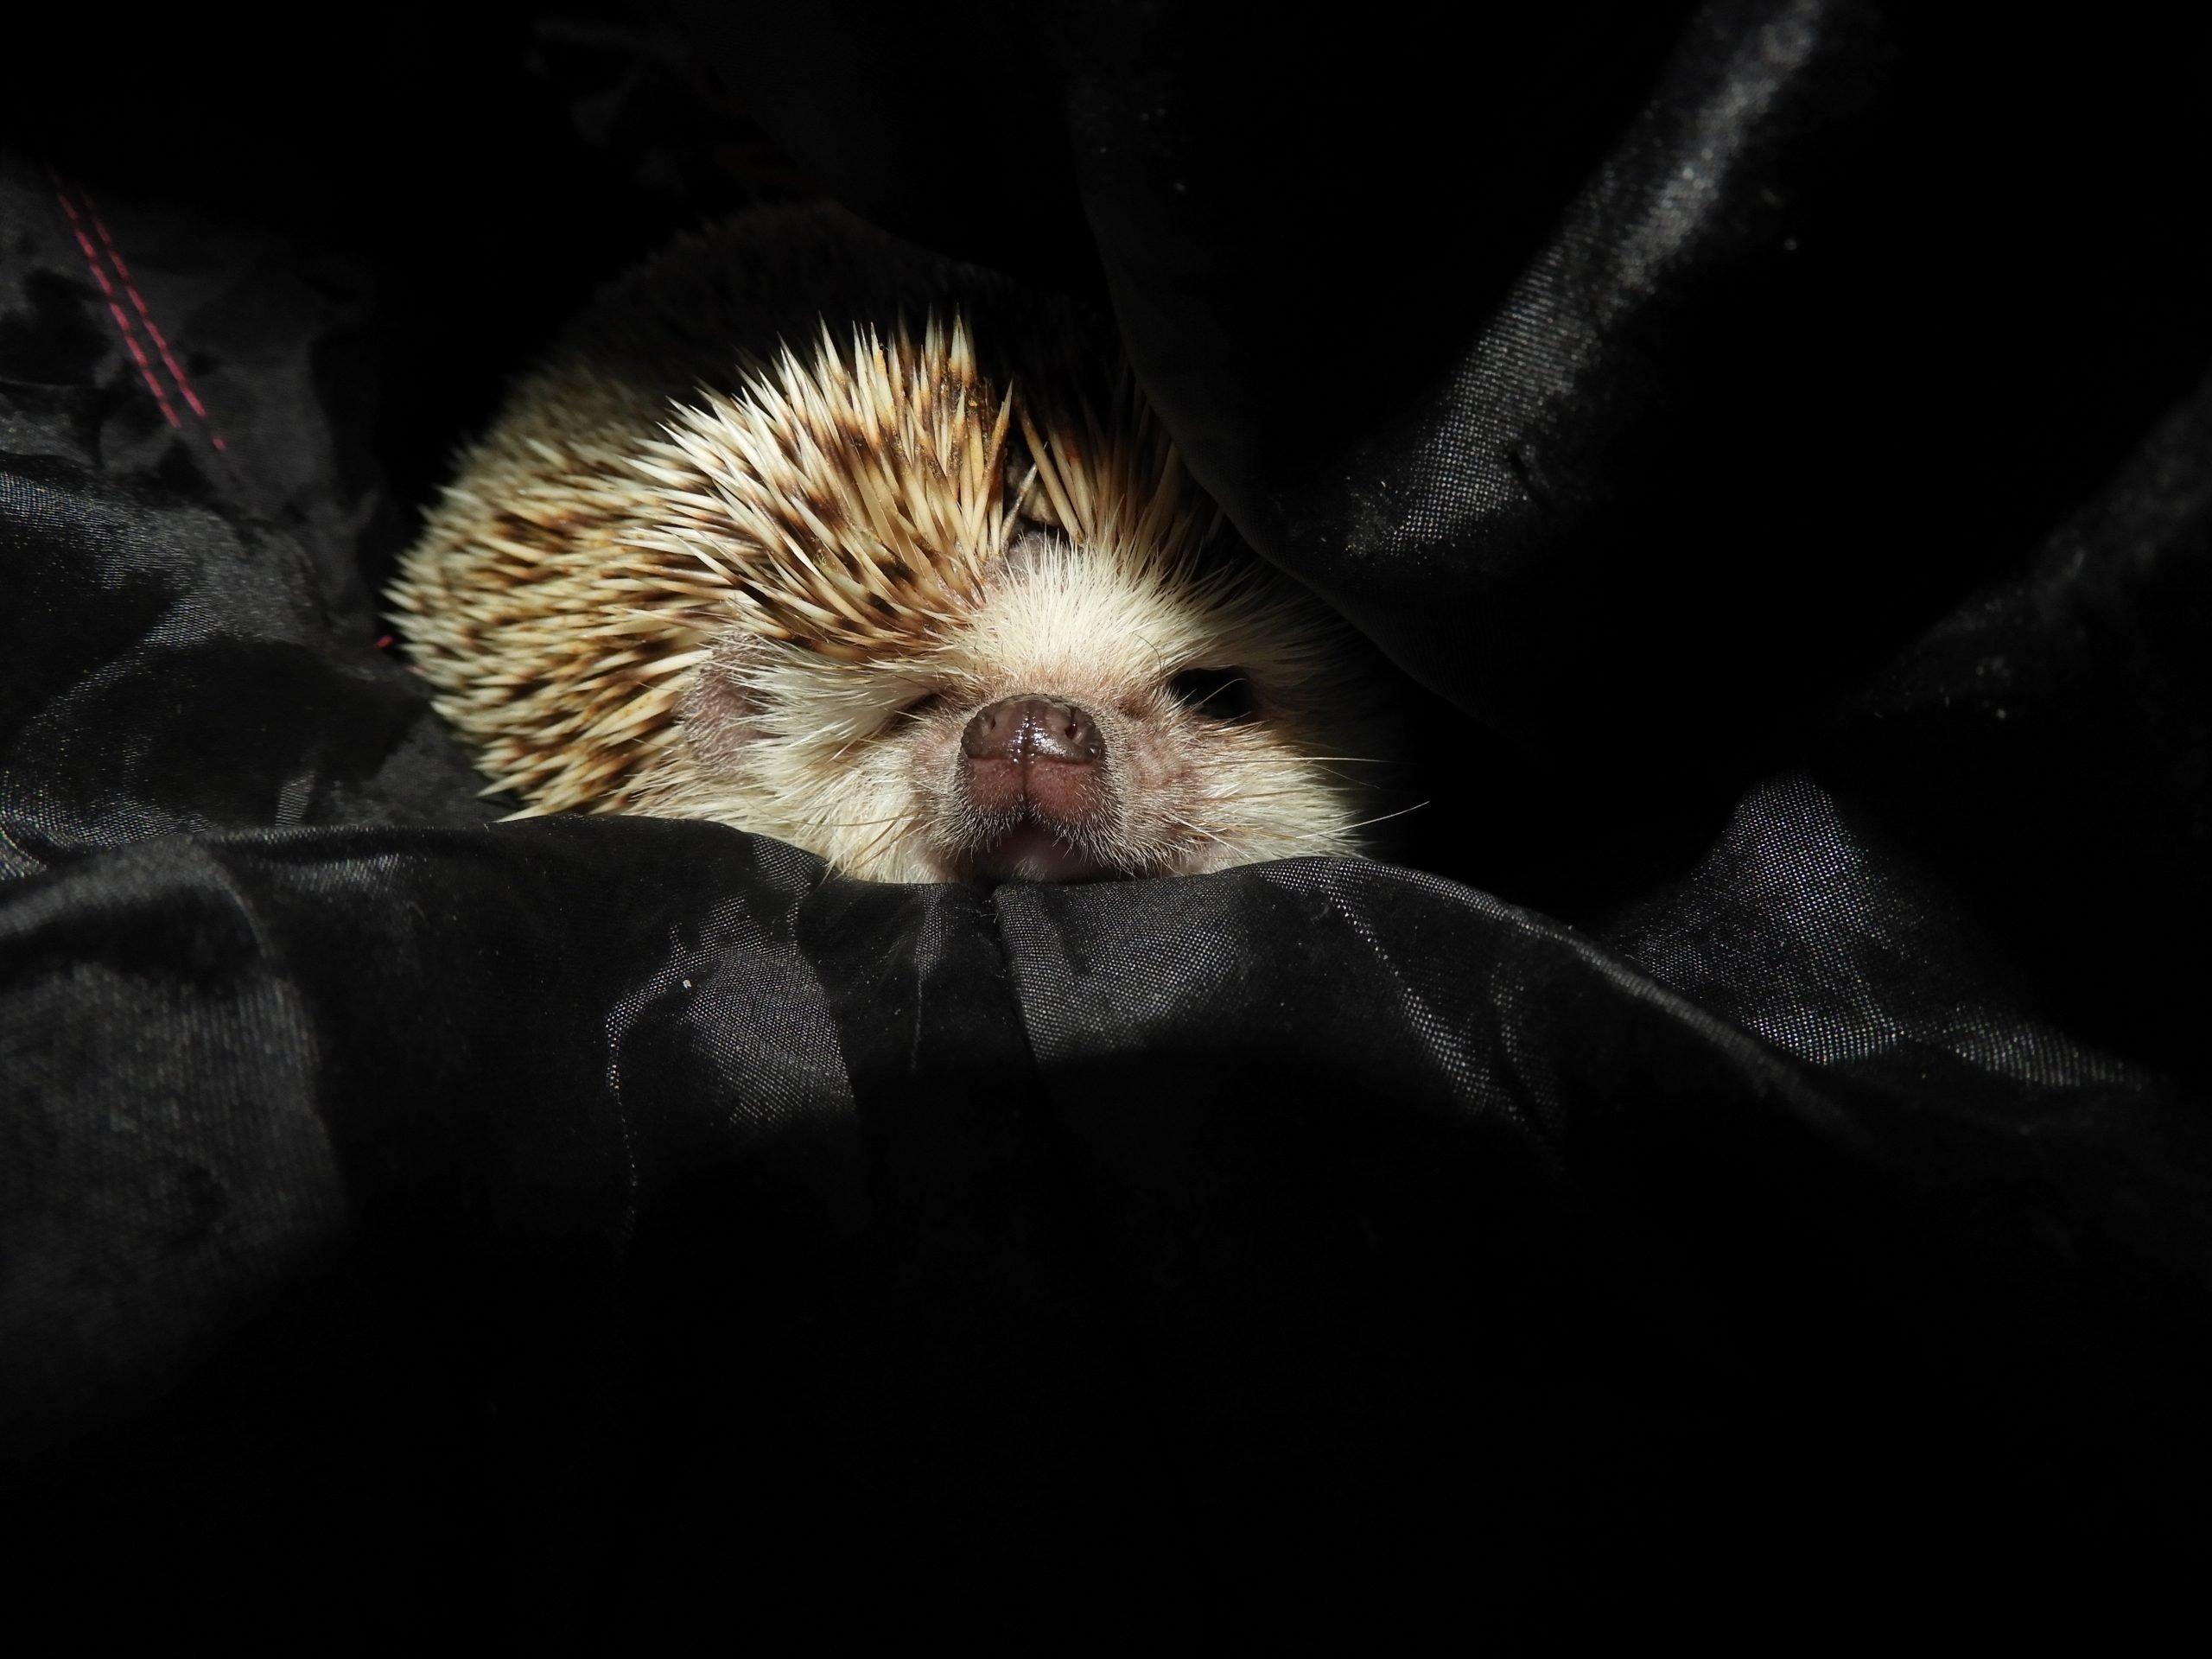 Close-Up Of Cozy Hedgehog In Blanket